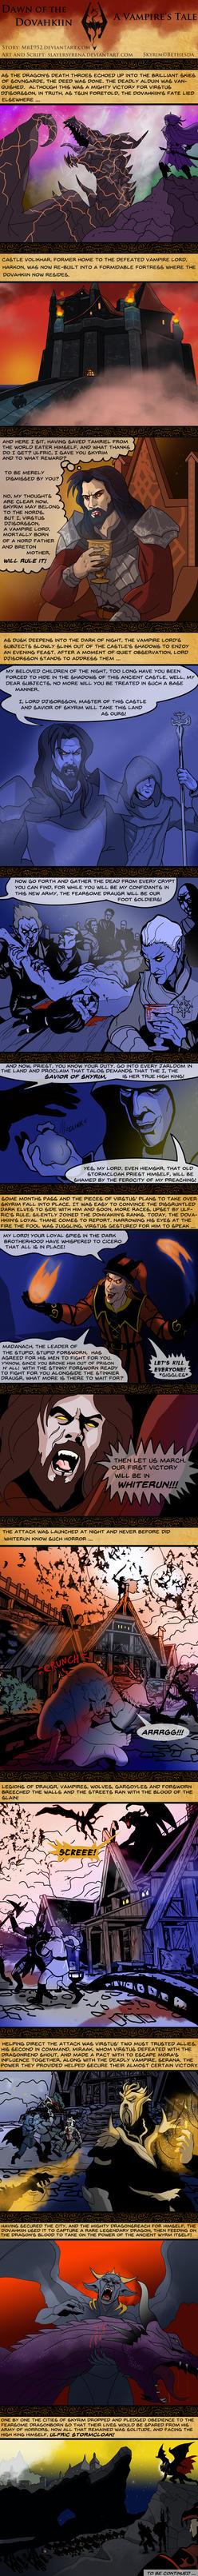 Skyrim: Dawn of the Dovahkiin by SlayerSyrena